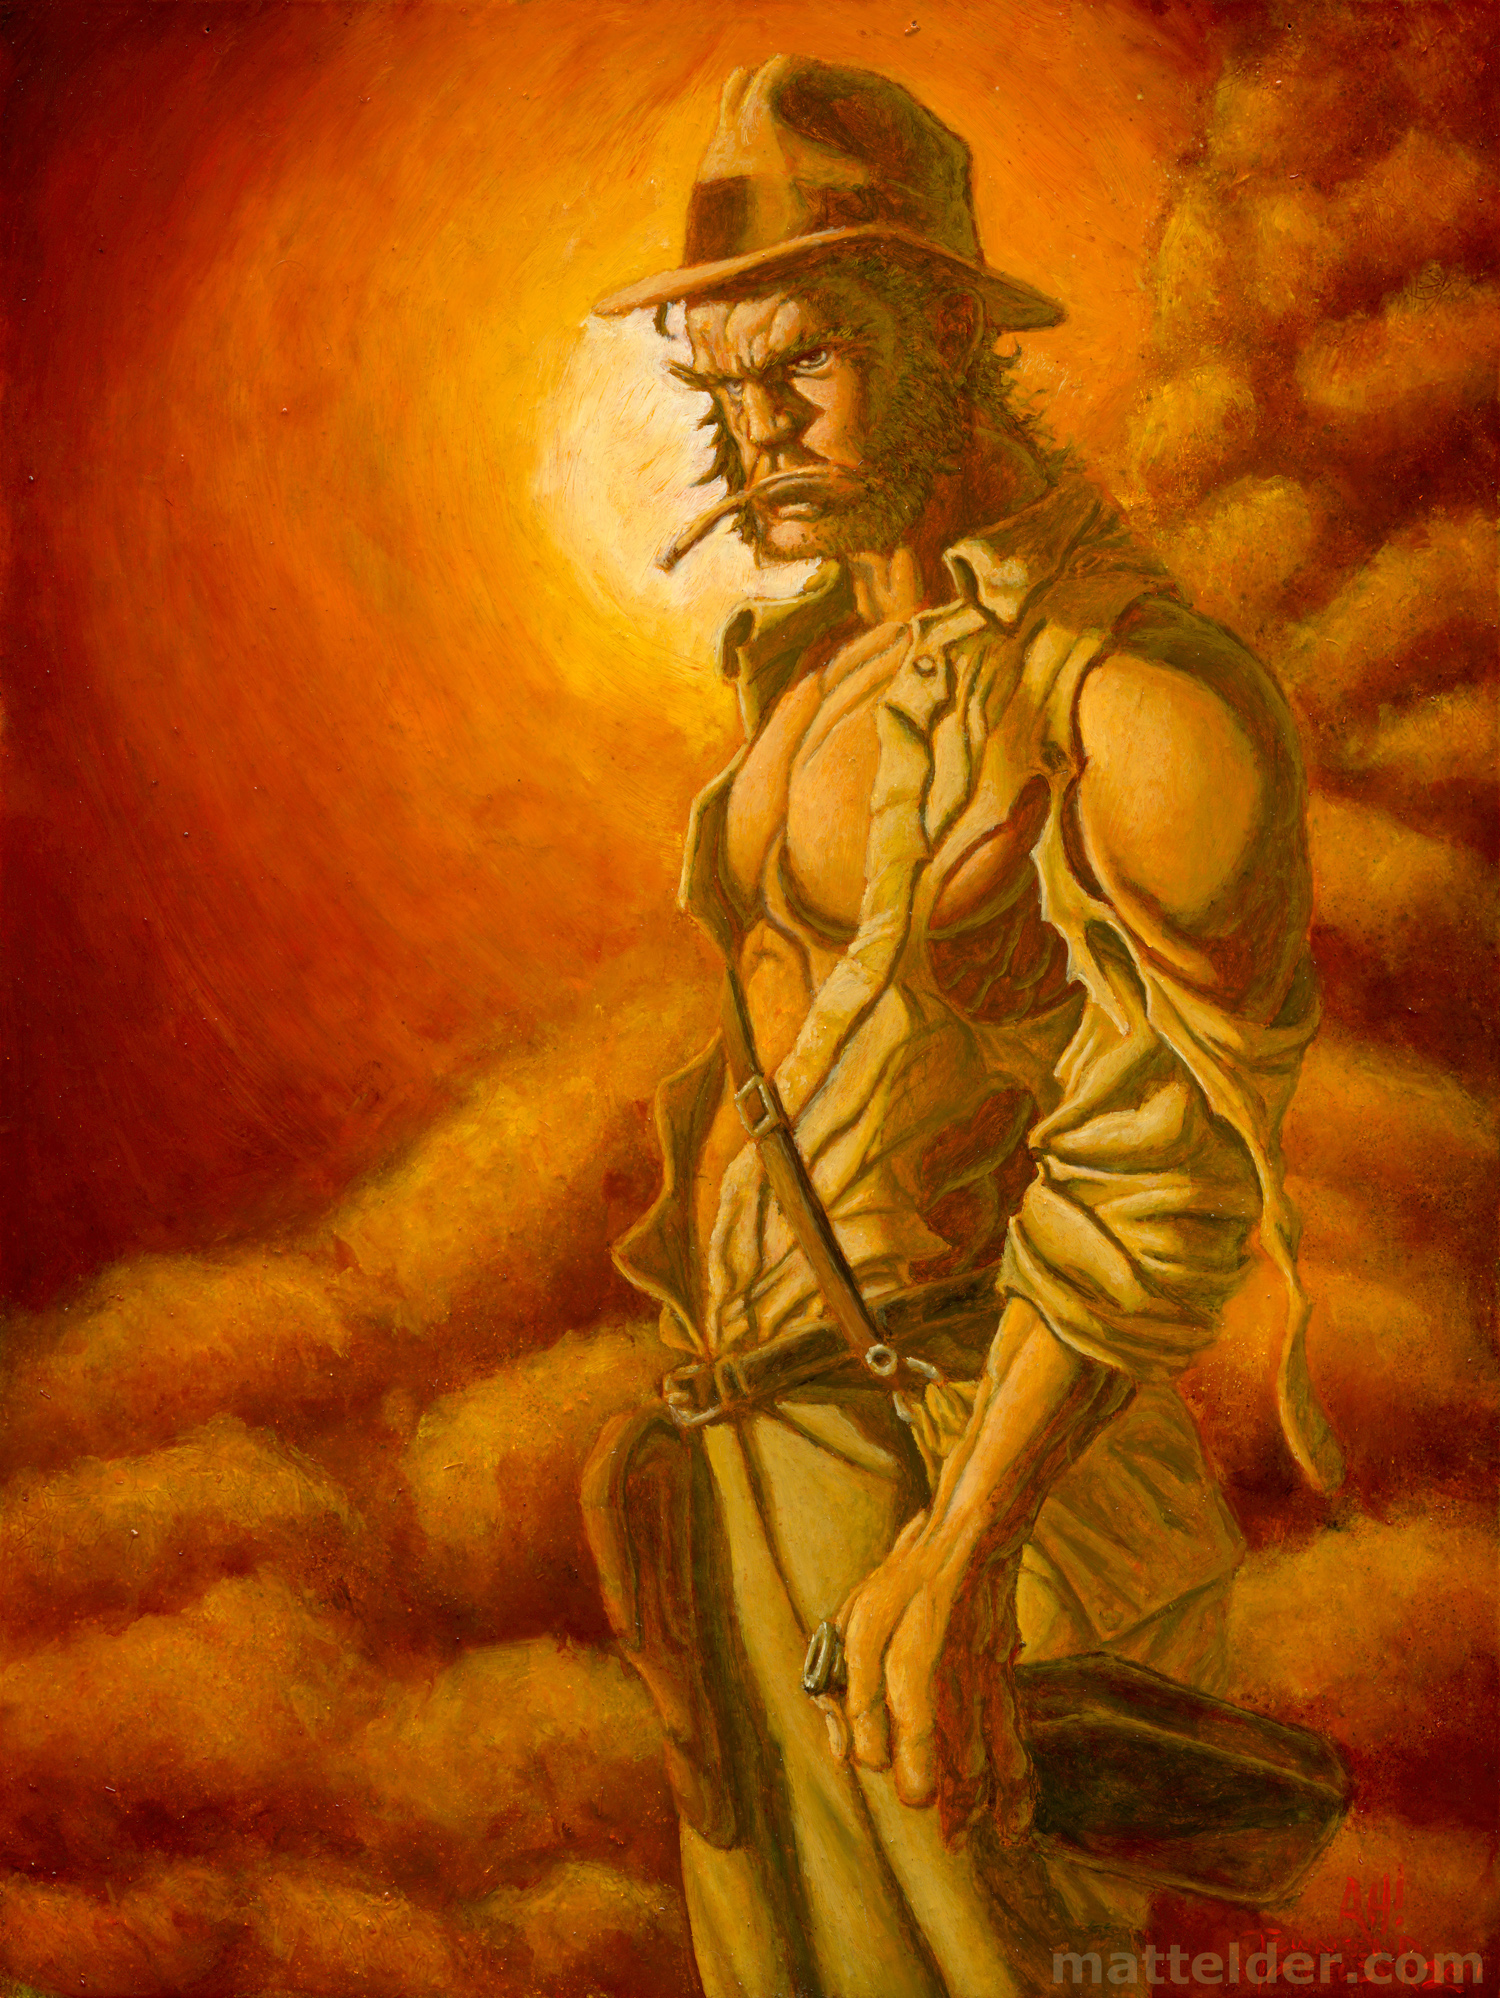 Wolverine as Indiana Jones